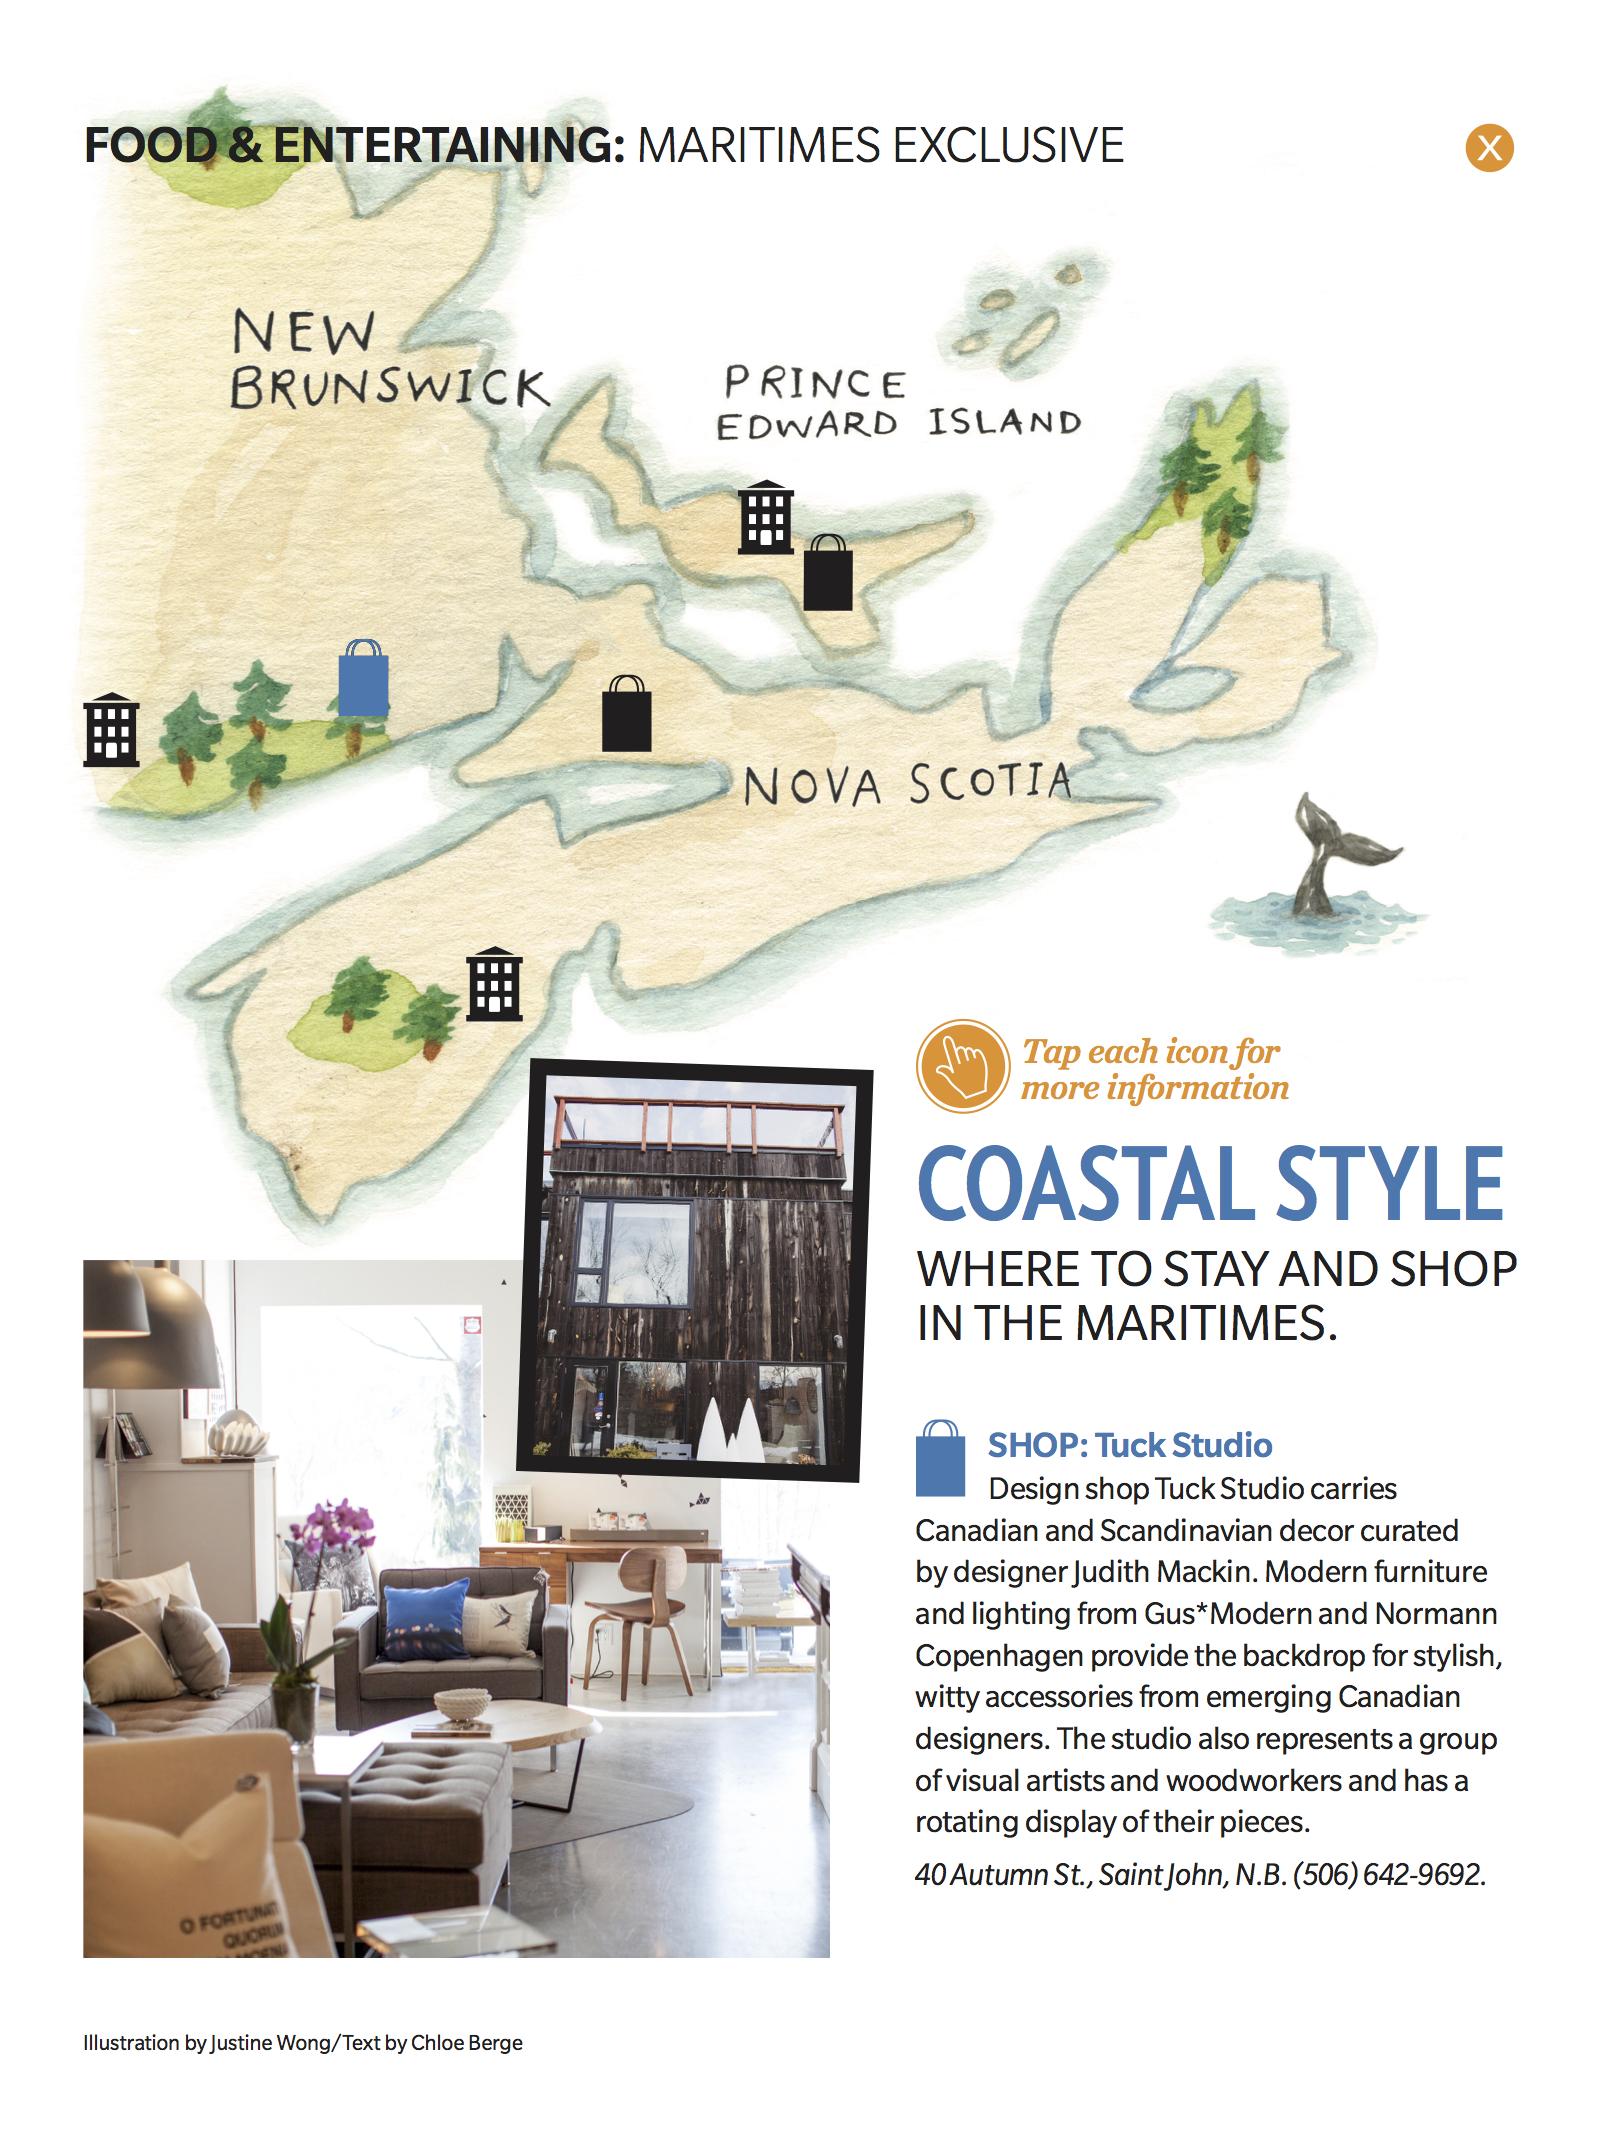 East Coast Travel Guide_House & Home Magazine iPad Edition_July 20142.jpg